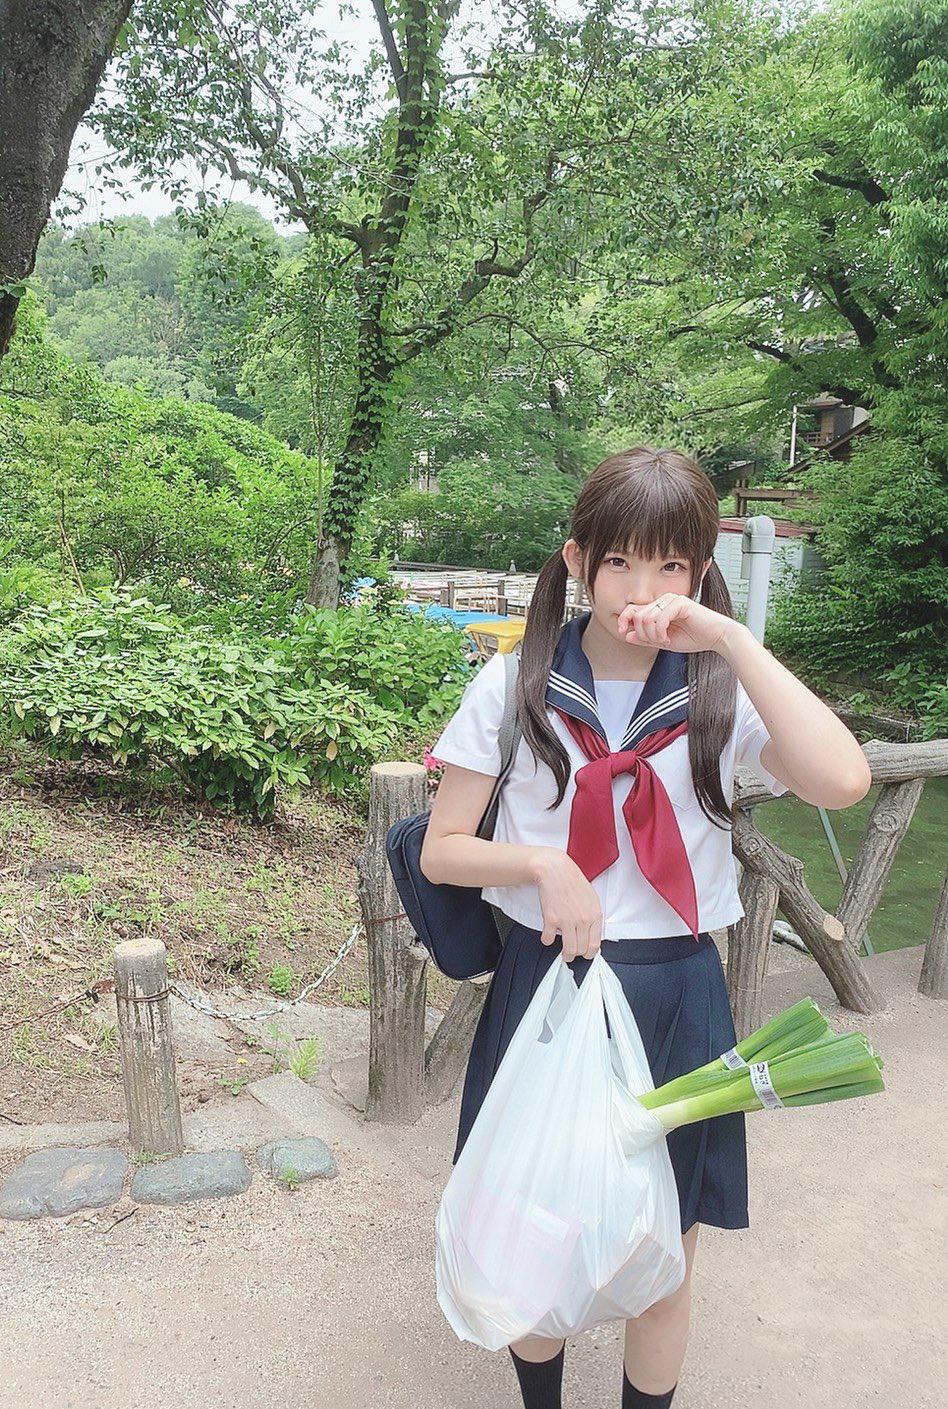 JK双马尾《女高中生Enako是我老婆》止不住的妄想这不就是梦寐以求的另一伴吗